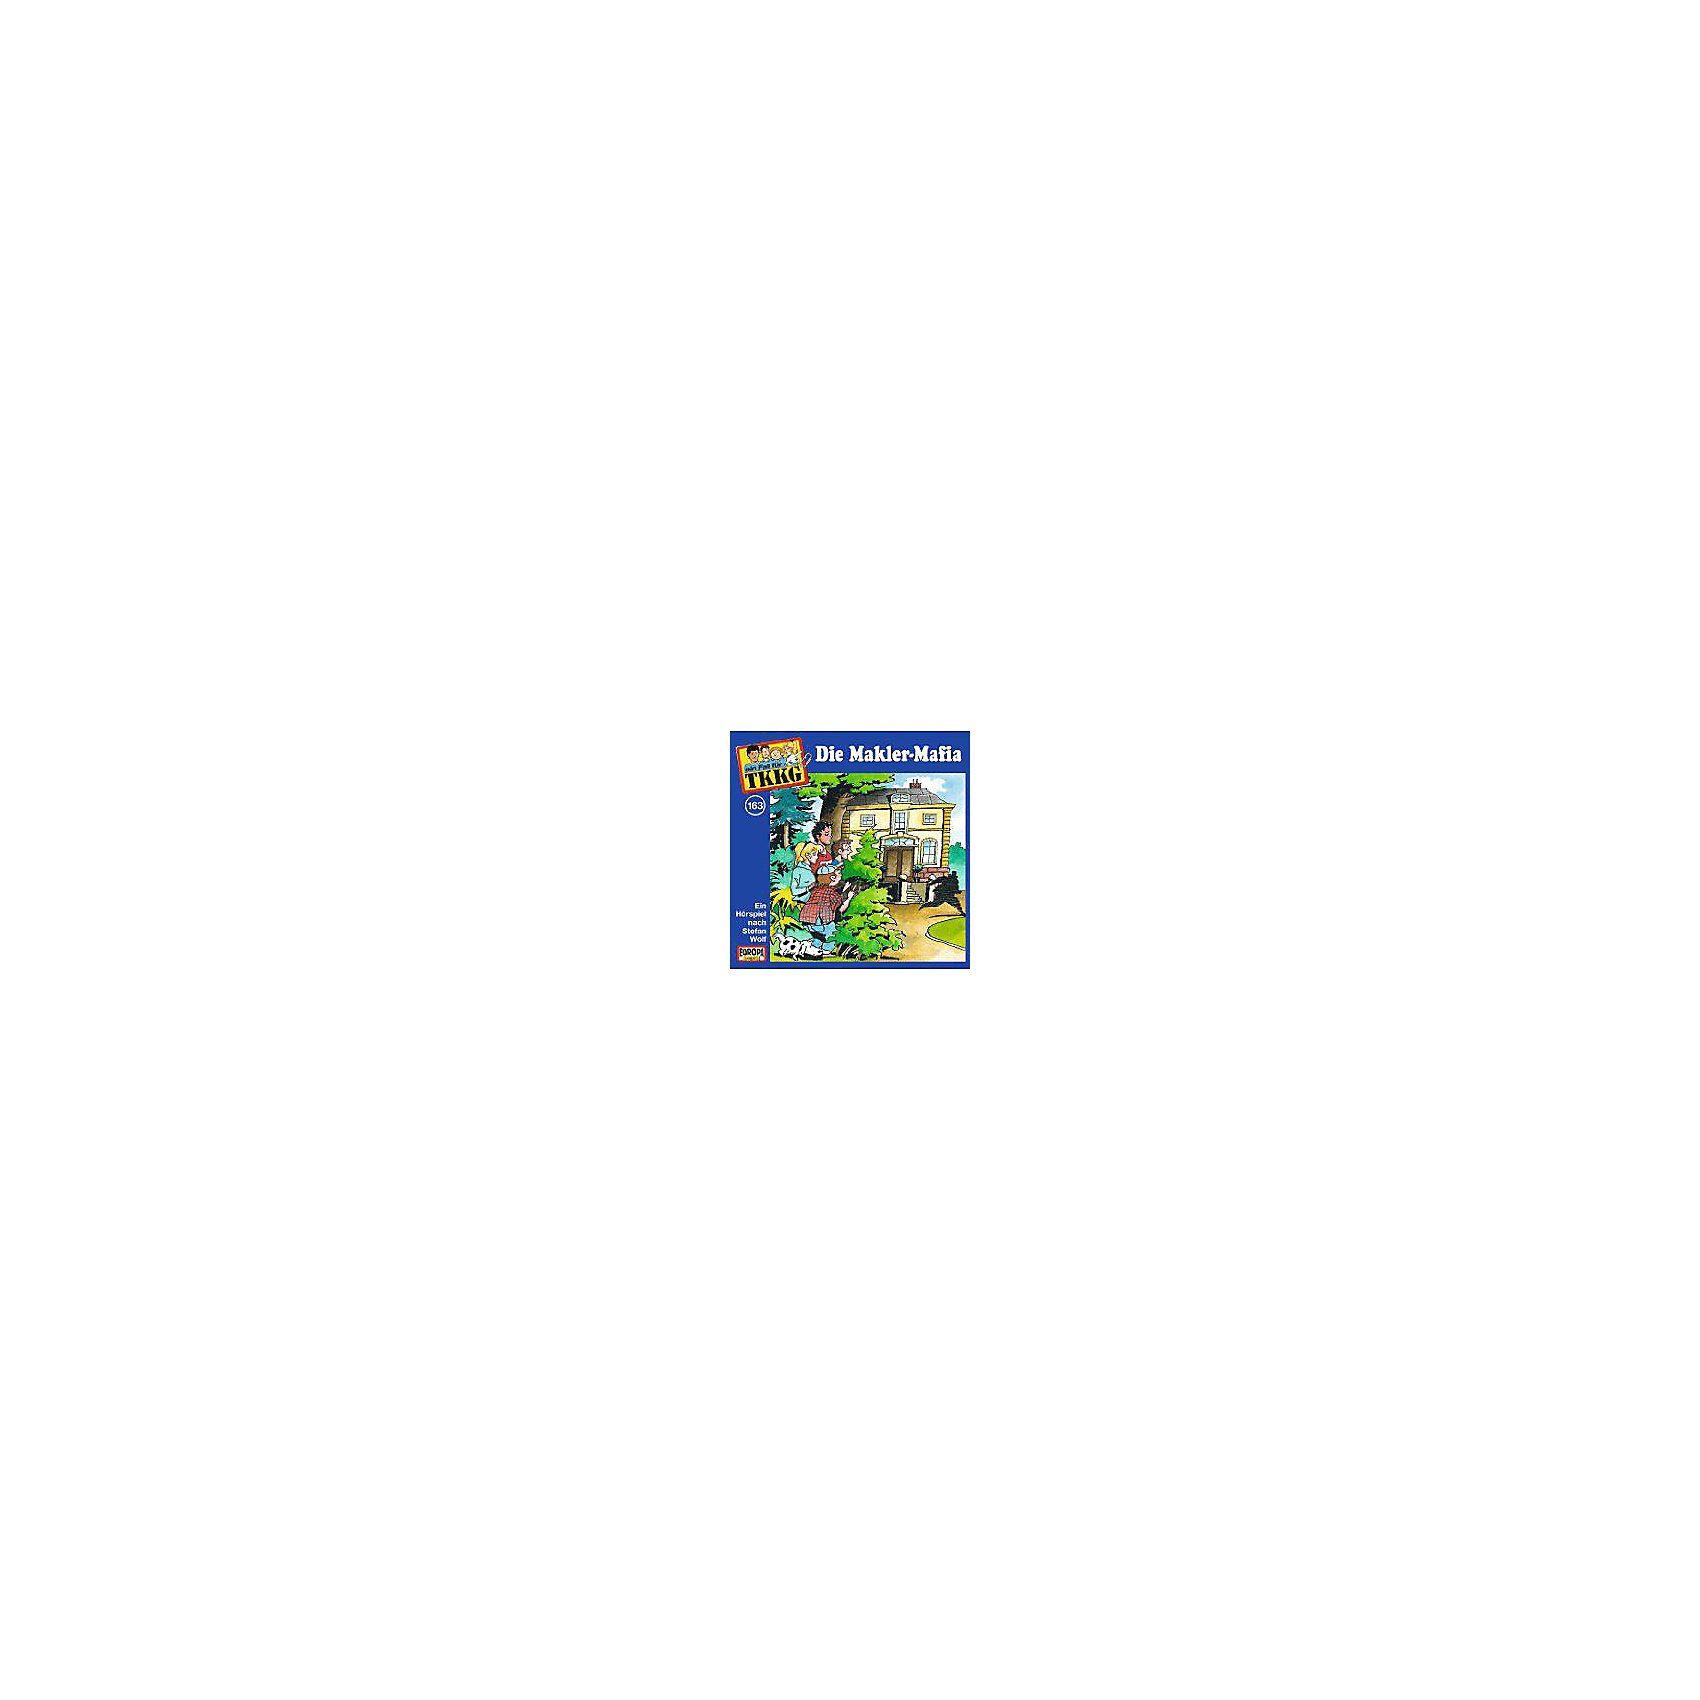 SONY BMG MUSIC CD TKKG 163 - Die Makler-Mafia